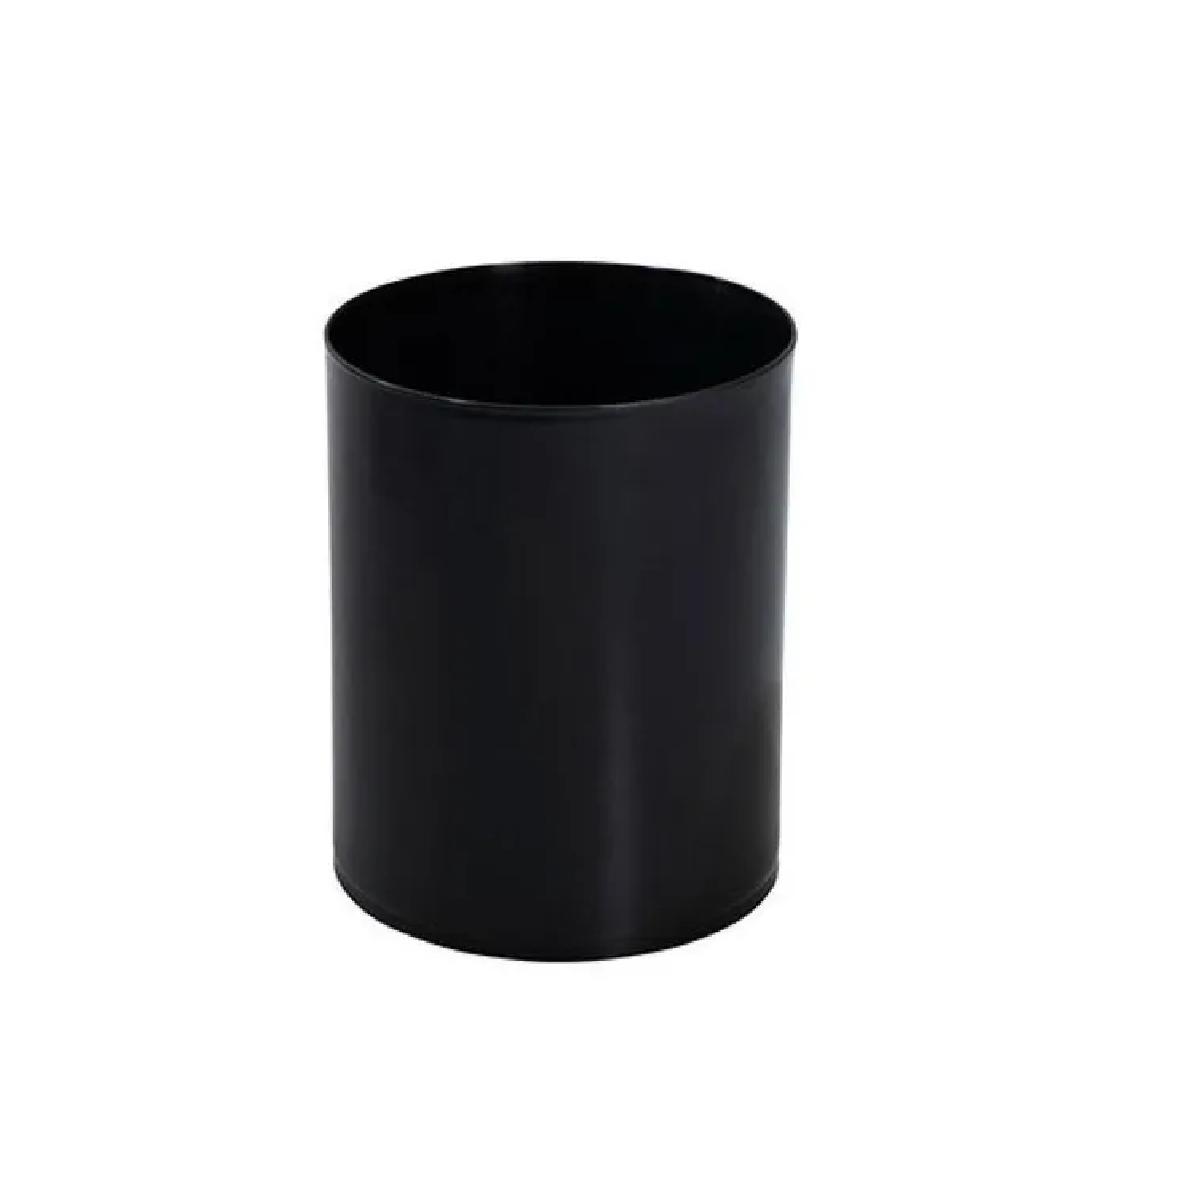 Lixeira plástica Preta Escritorio12L sem tampa EB1 29cm Jsn  - LZ COZINHA